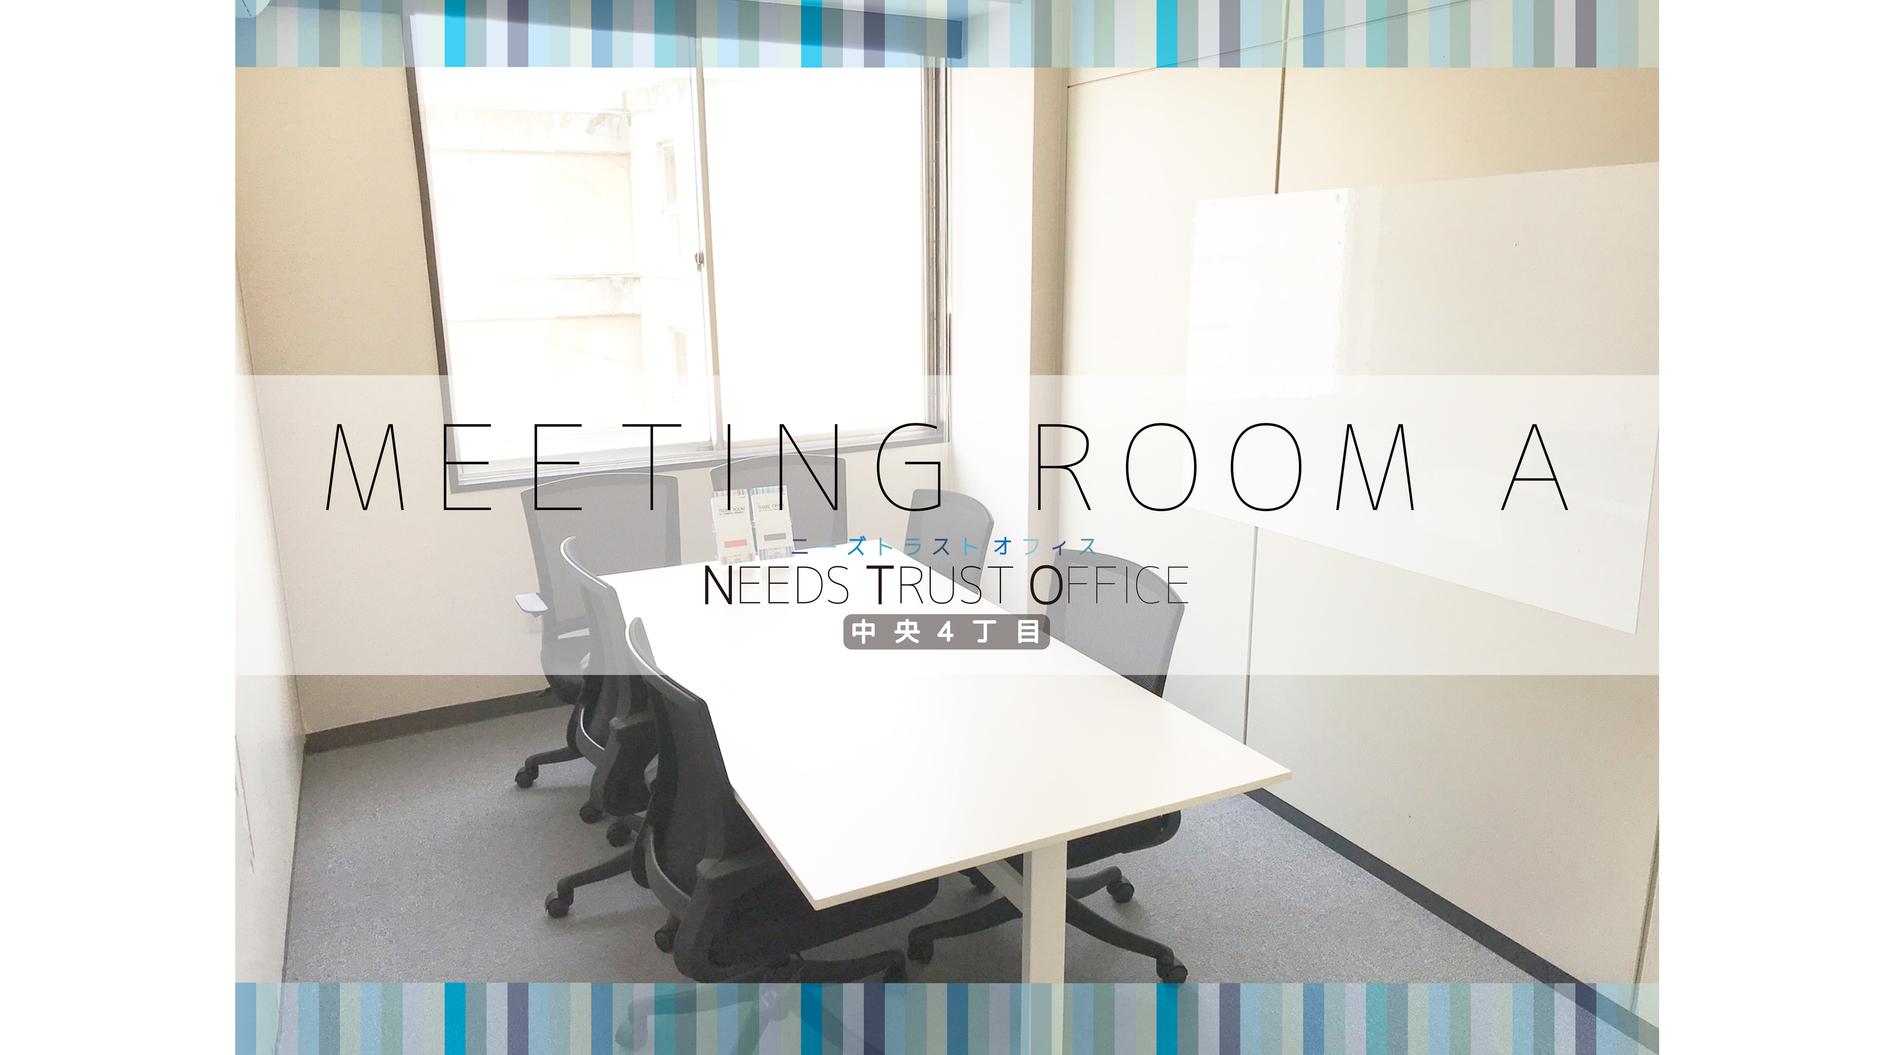 <NTO MEETING ROOM A>仙台駅西口より徒歩5分/シェアオフィス内の会議室(<NEEDS TRUST OFFICE >仙台駅西口より徒歩5分/シェアオフィス内の会議室) の写真0